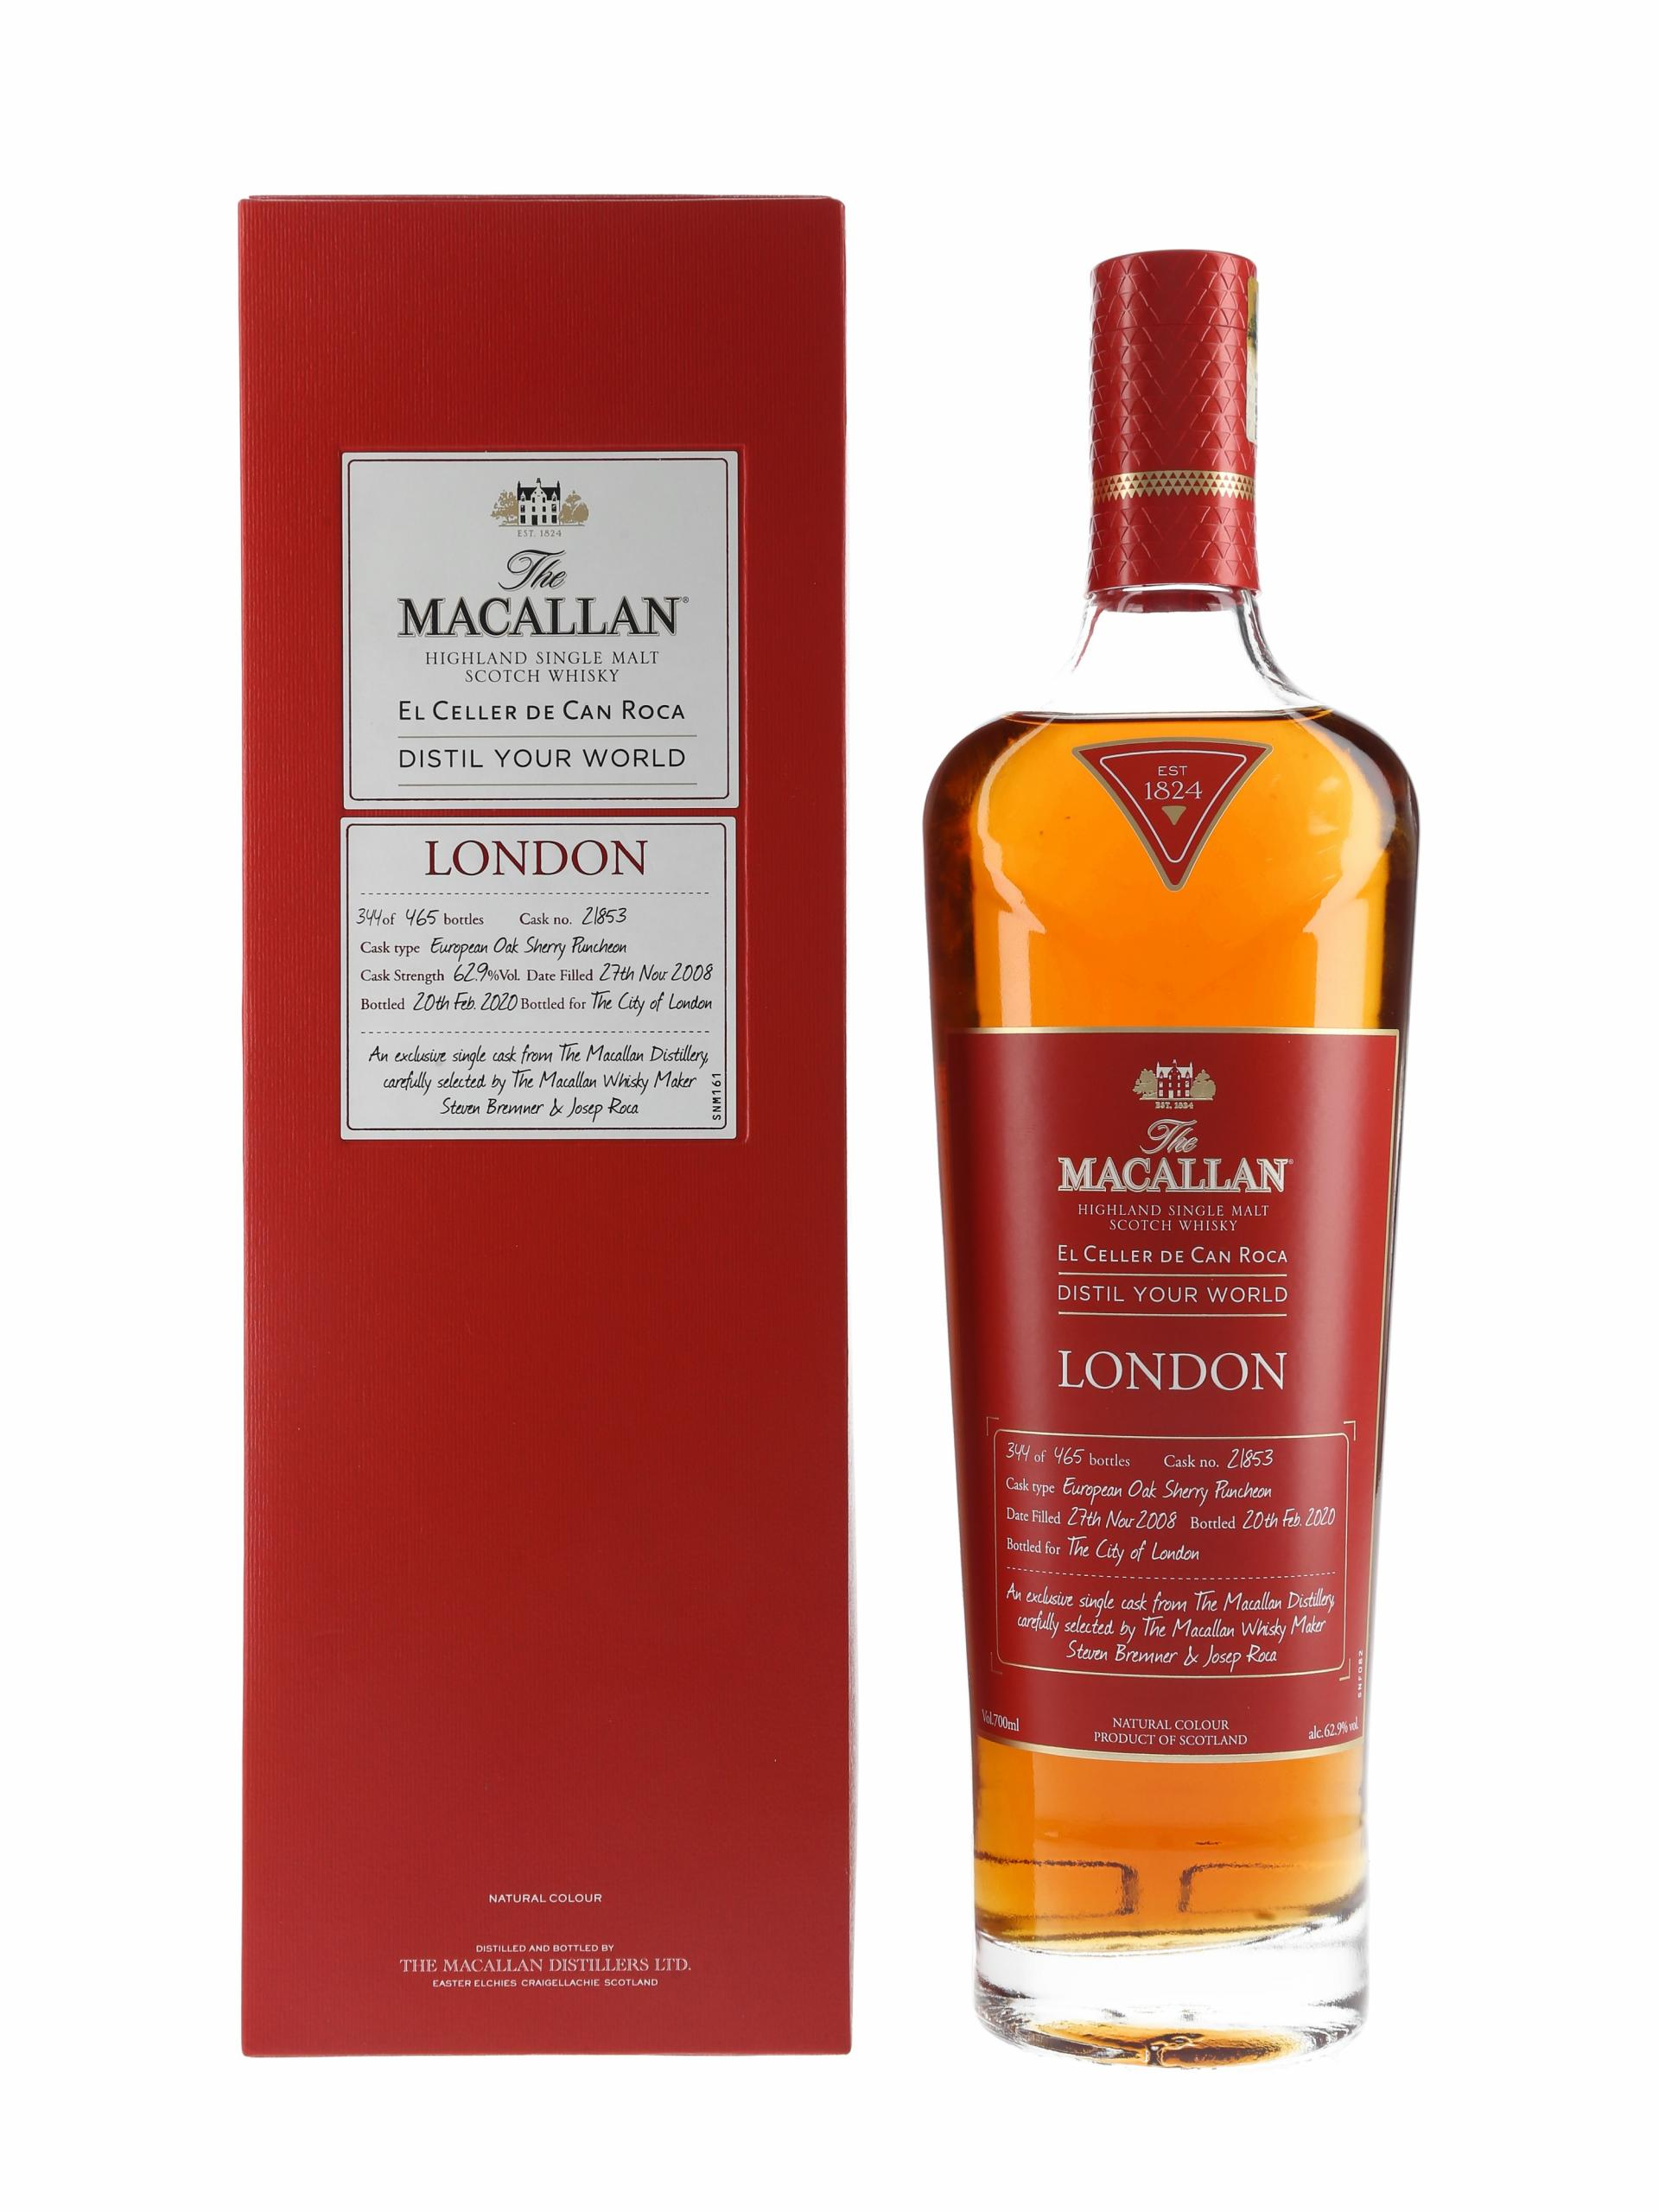 Macallan 2008 Distil Your World London Edition Bottled 2020 - Single Cask